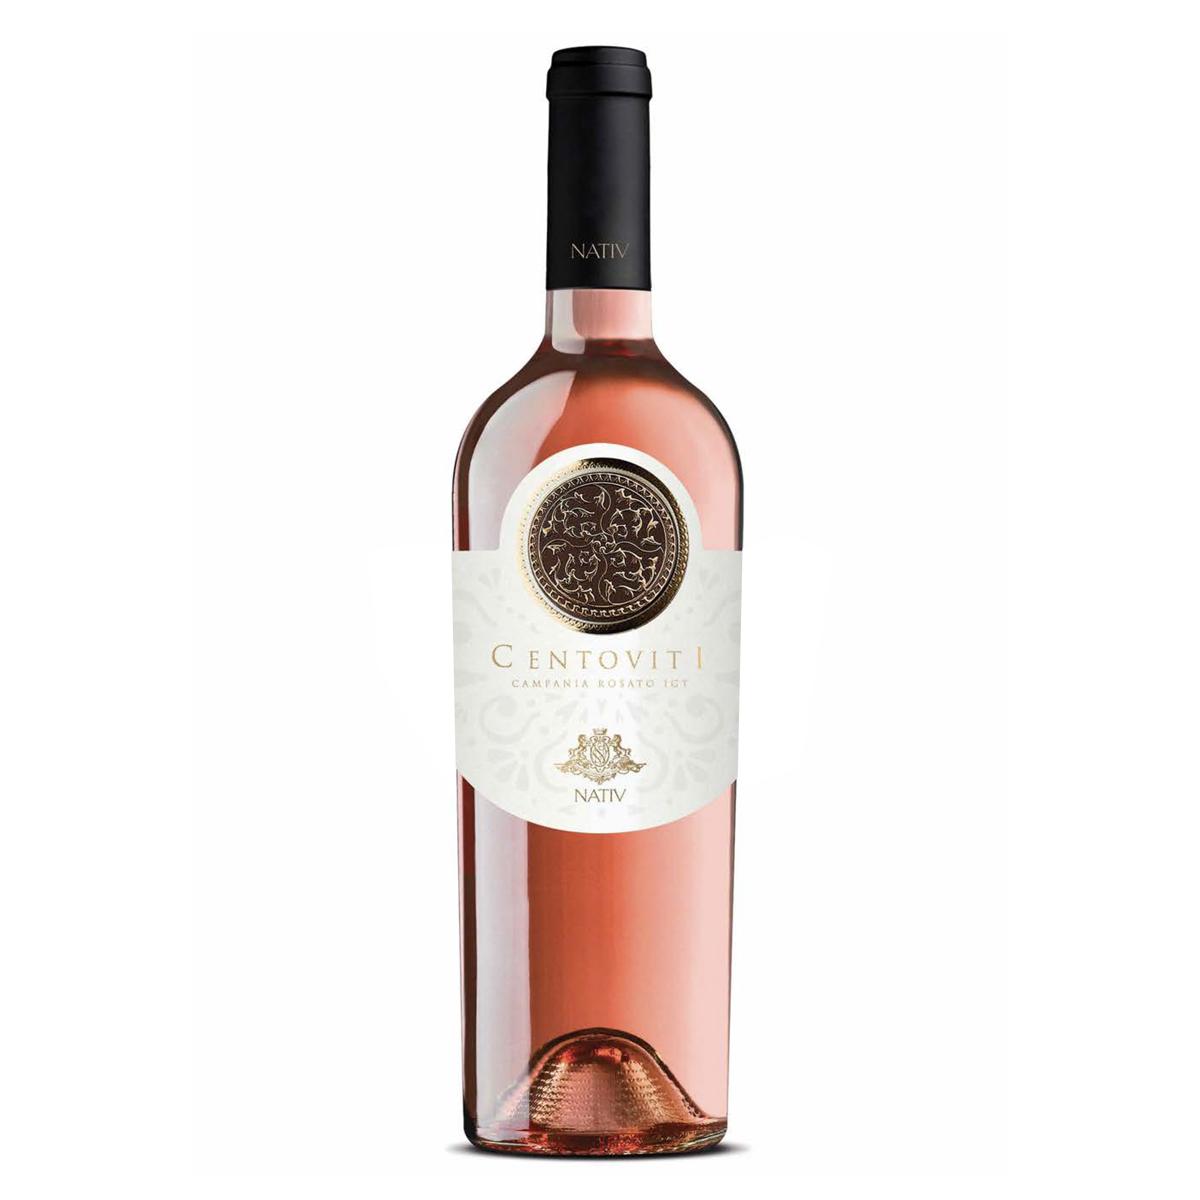 centoviti Campania rosato IGT nativ